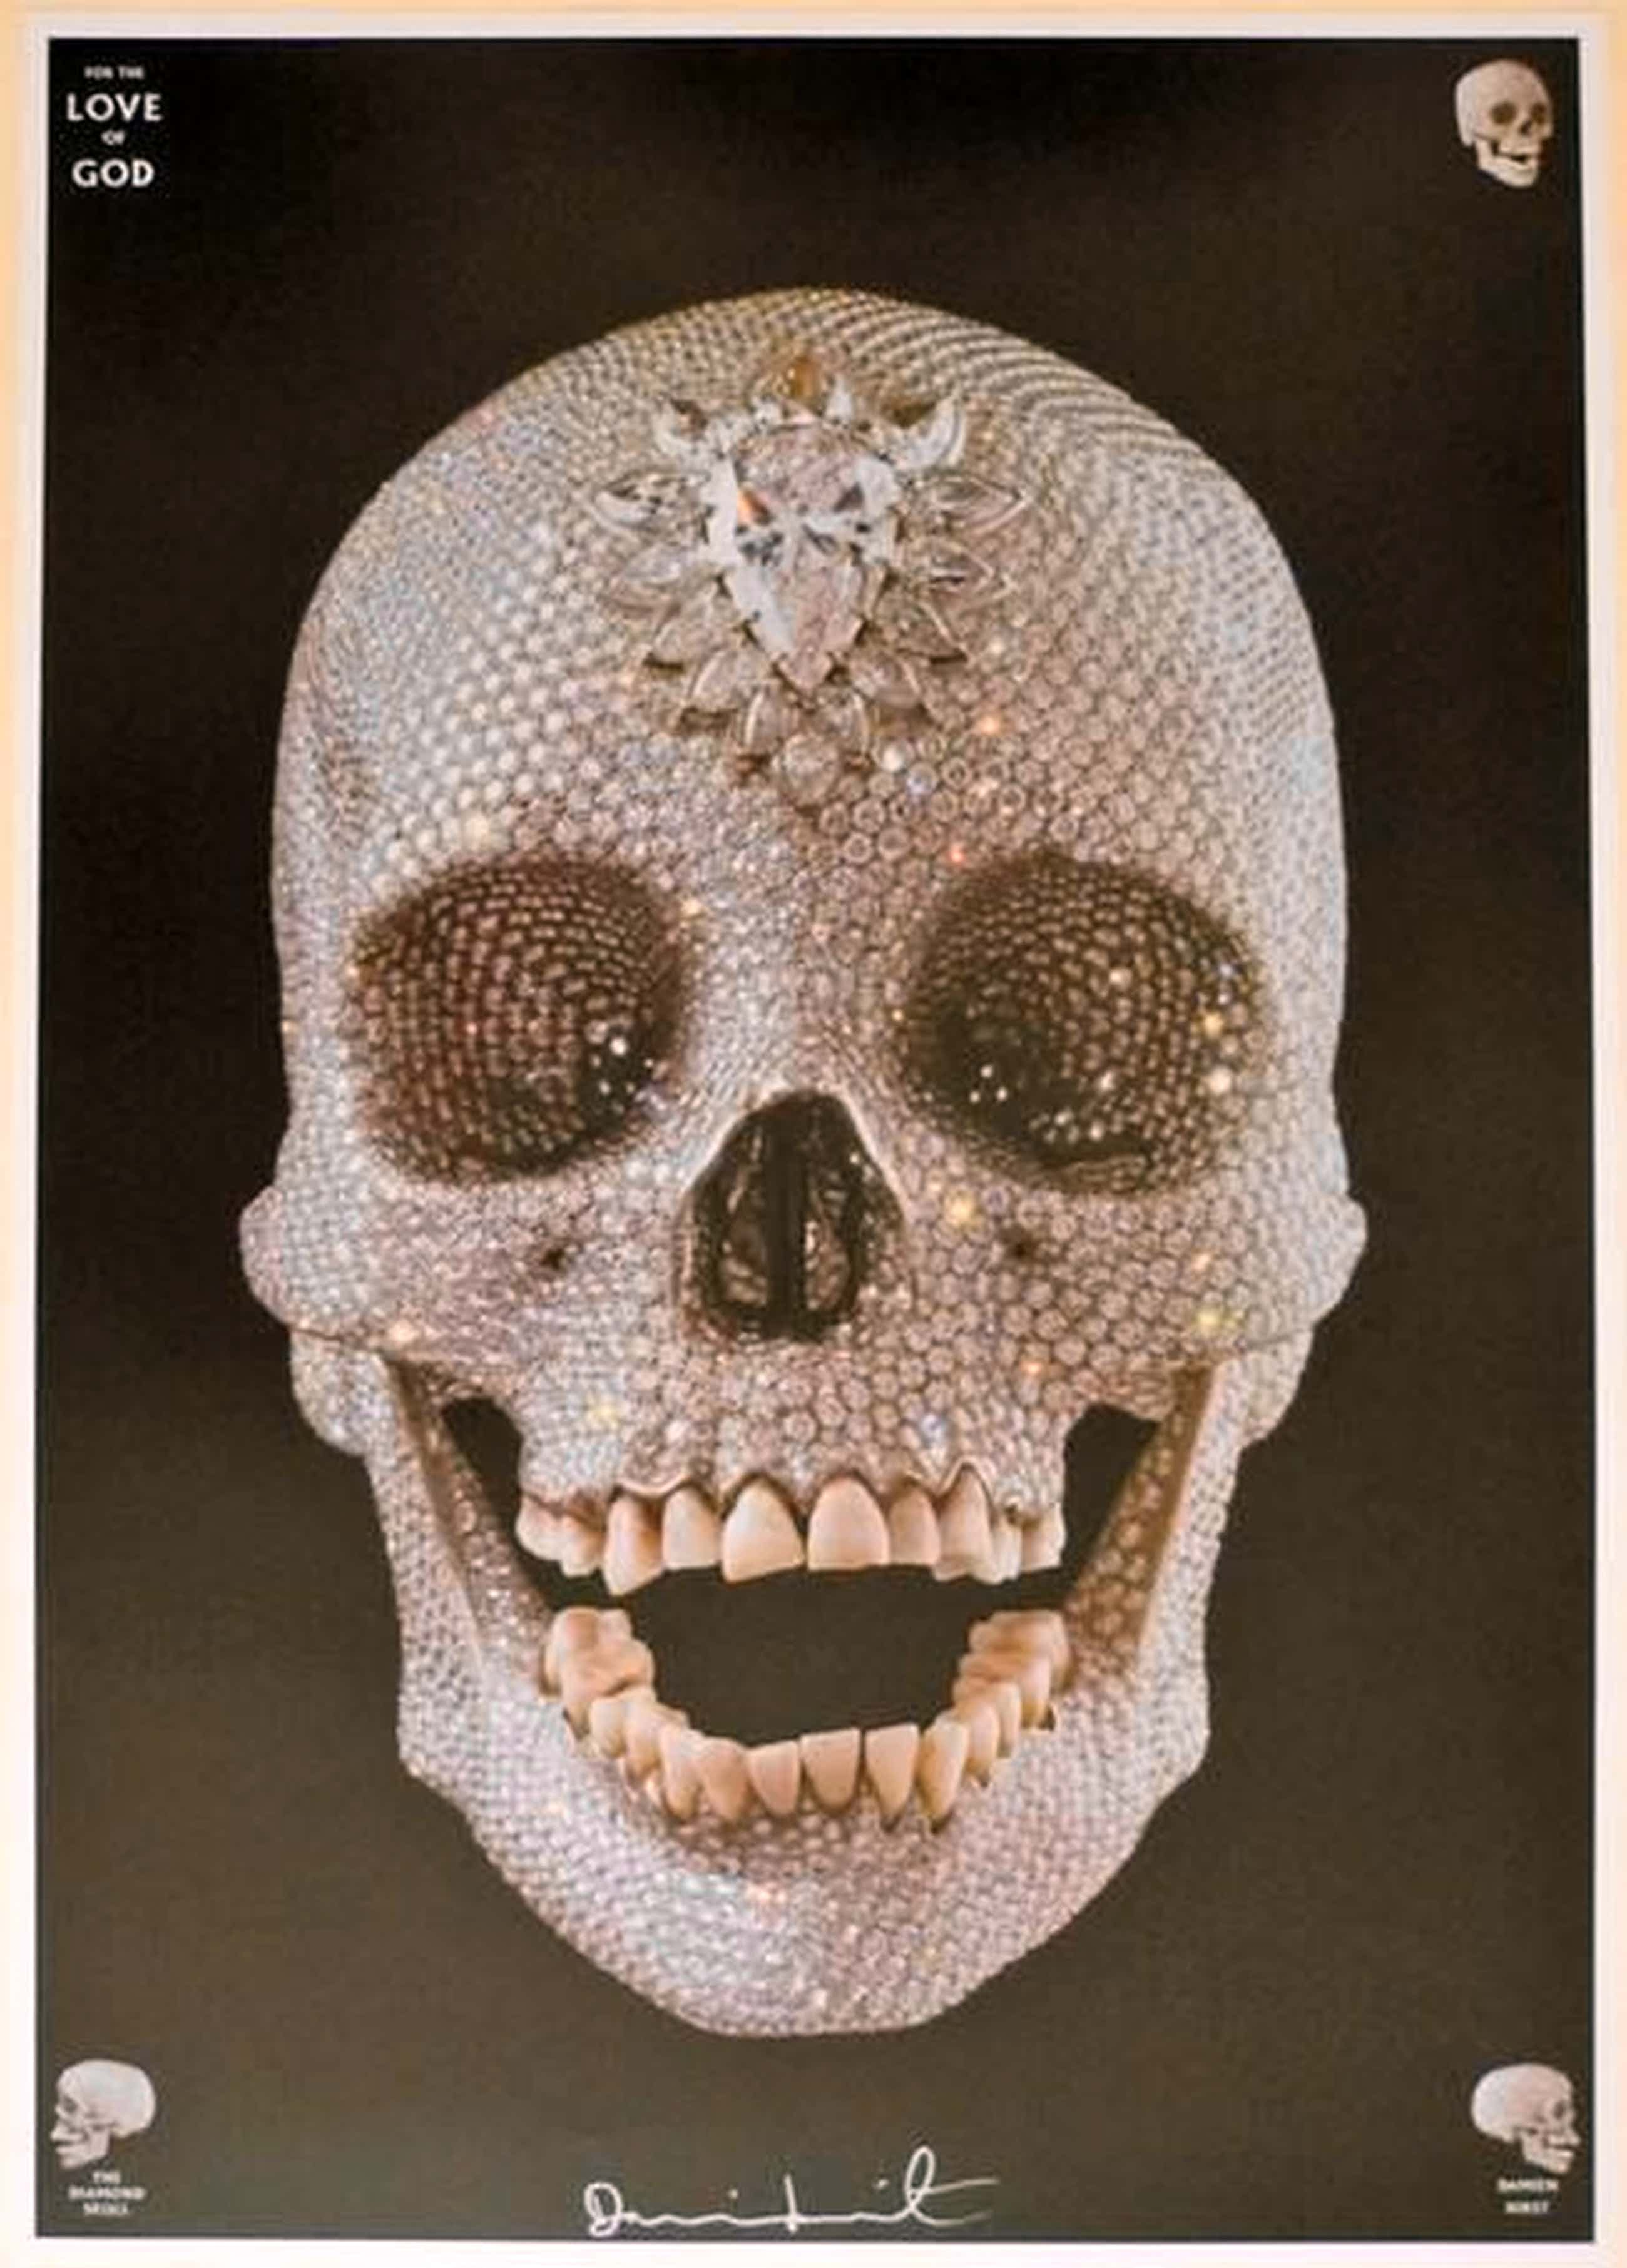 Damien Hirst - For the Love of God, handsigniert kopen? Bied vanaf 1900!